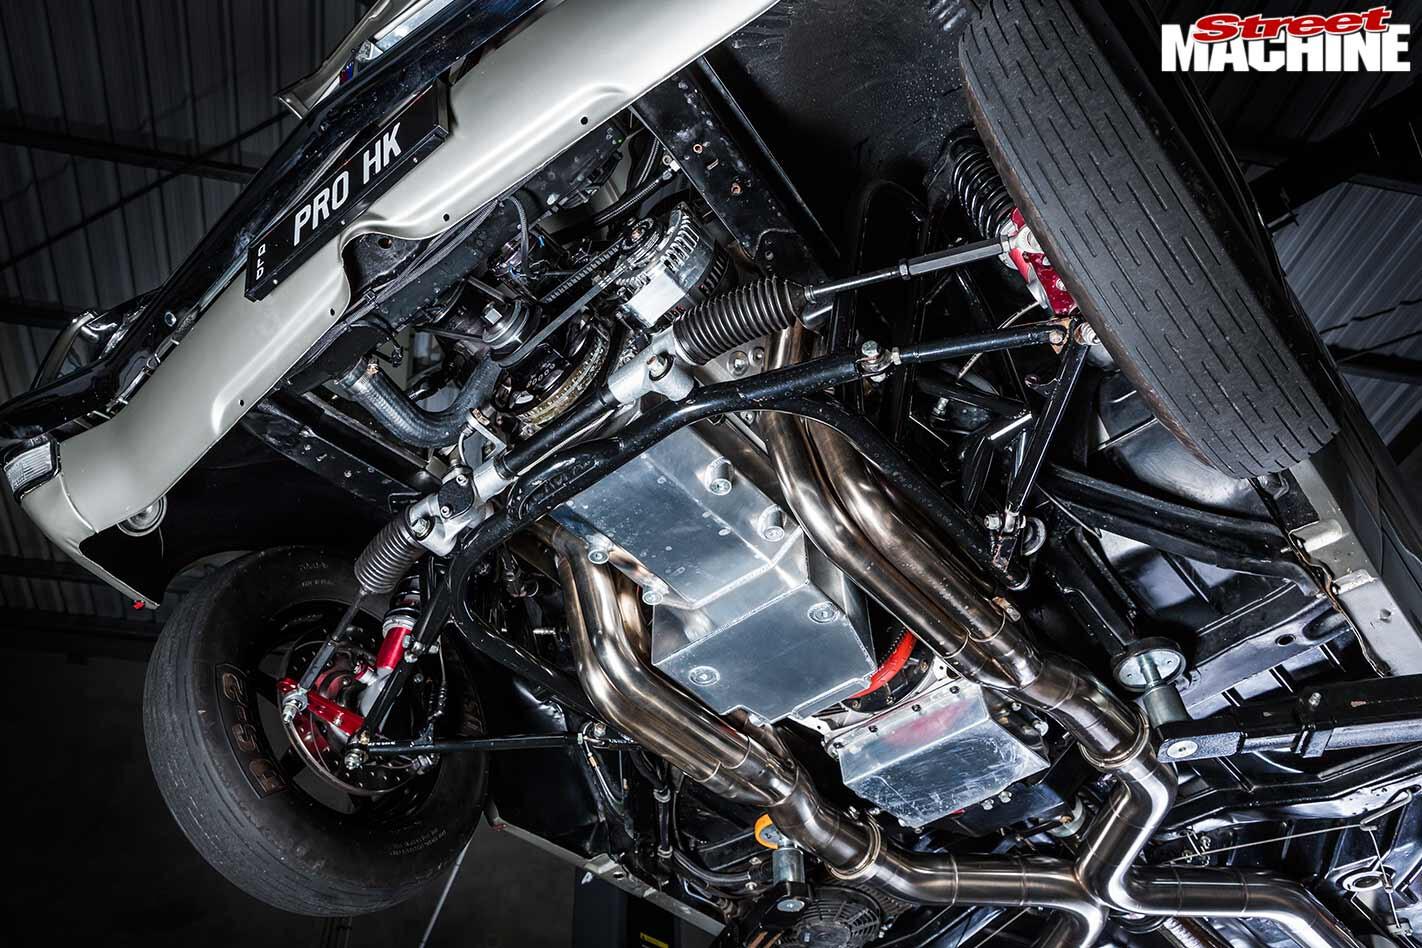 Holden HK Monaro GTS underside